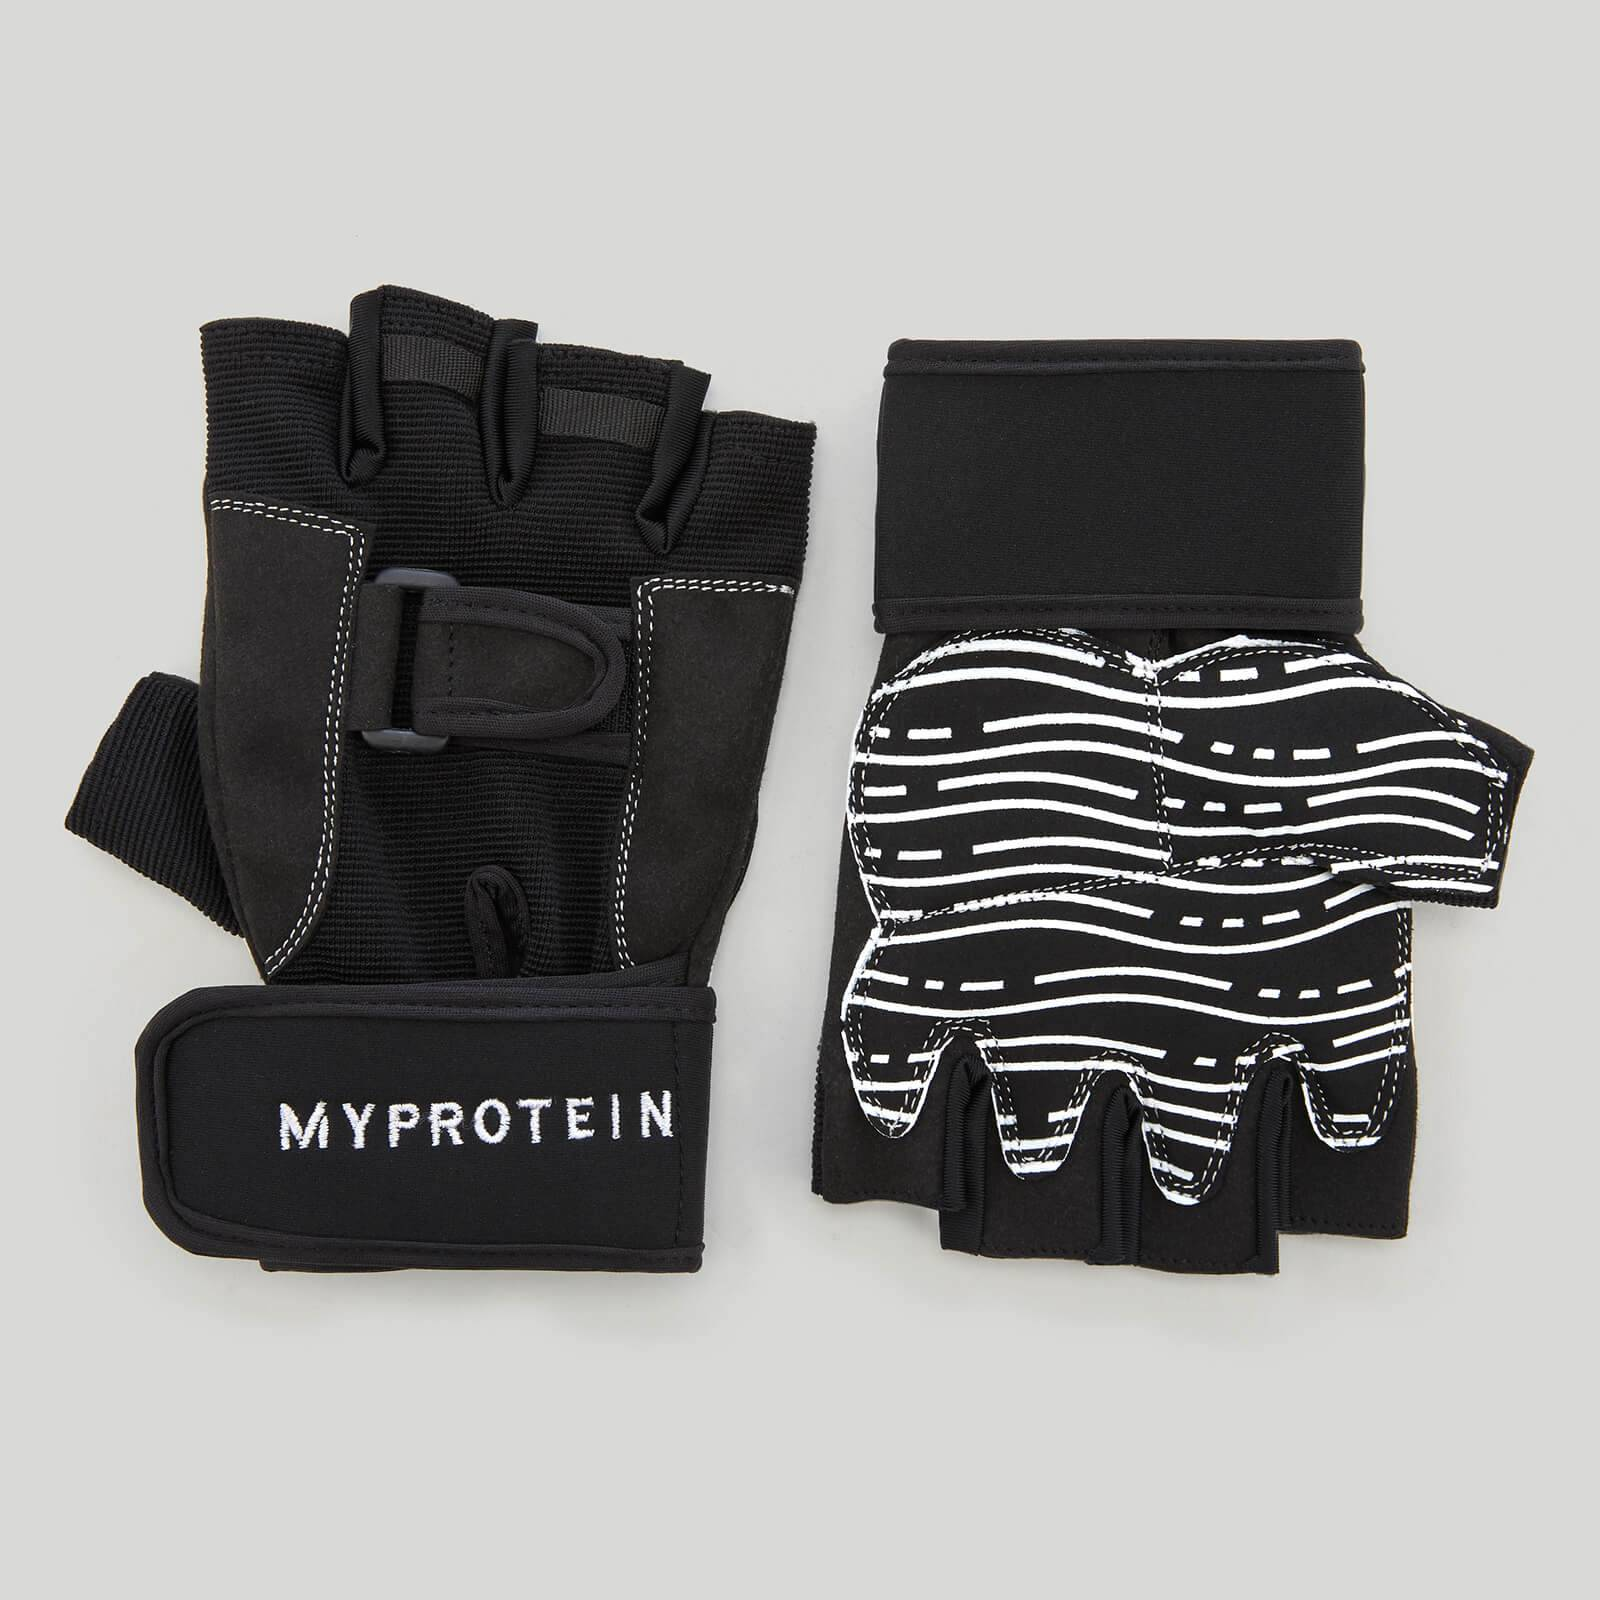 Myprotein Pro Training Lifting Gloves - M - Black